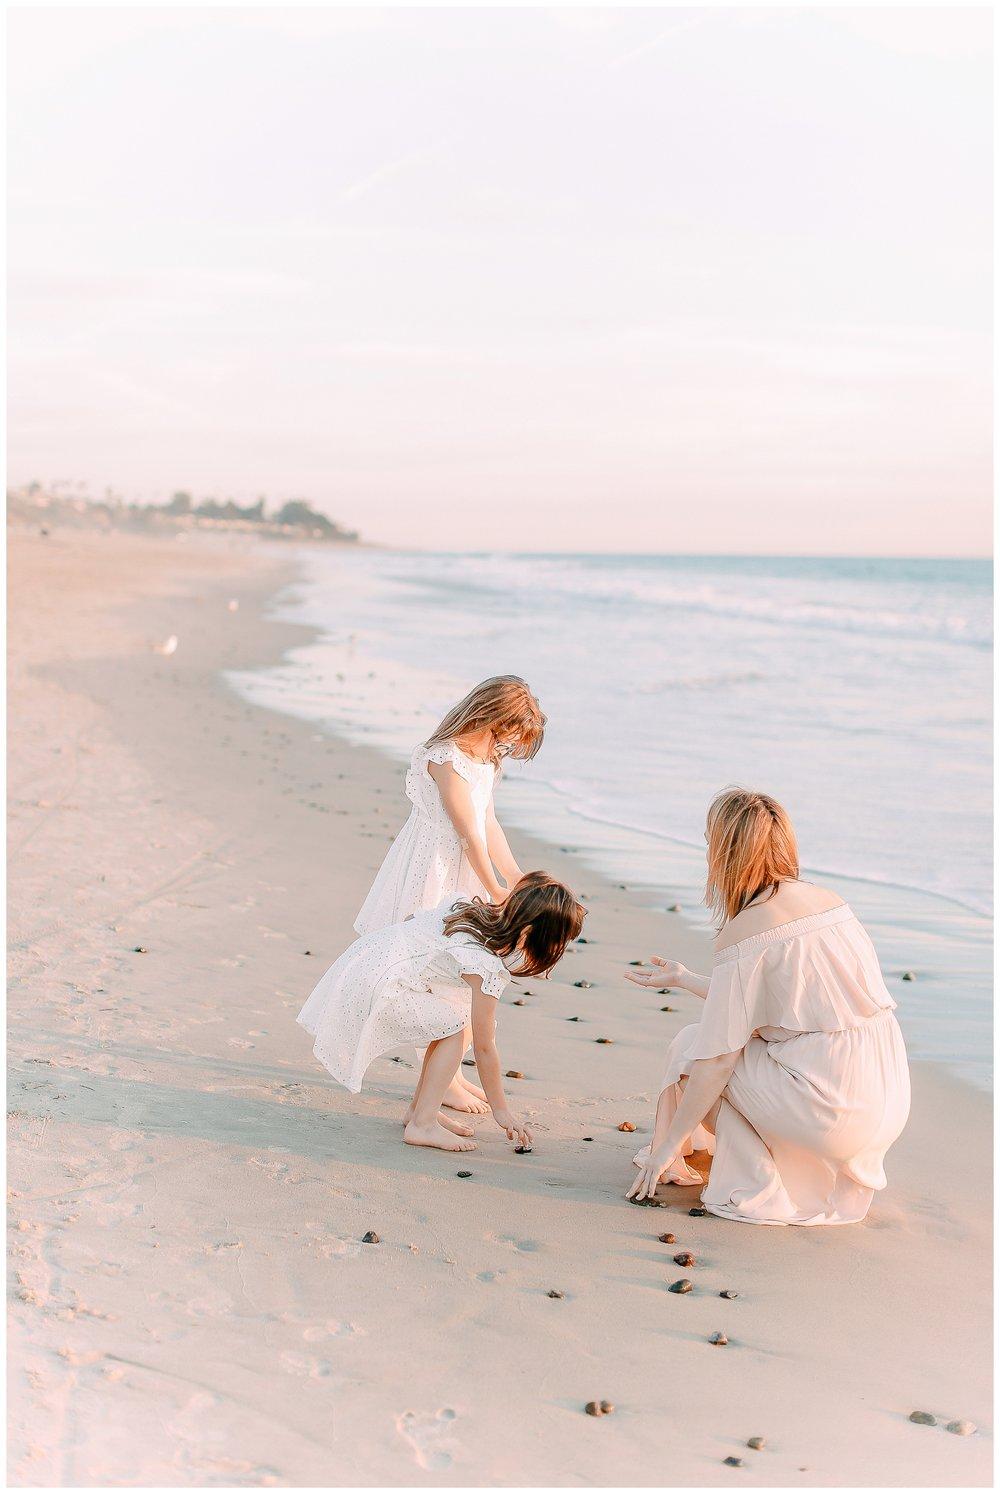 San_clemente_family_session_Orange_county_family_photographer_cori_kleckner_photography_laguna_beach_family_session_0685.jpg